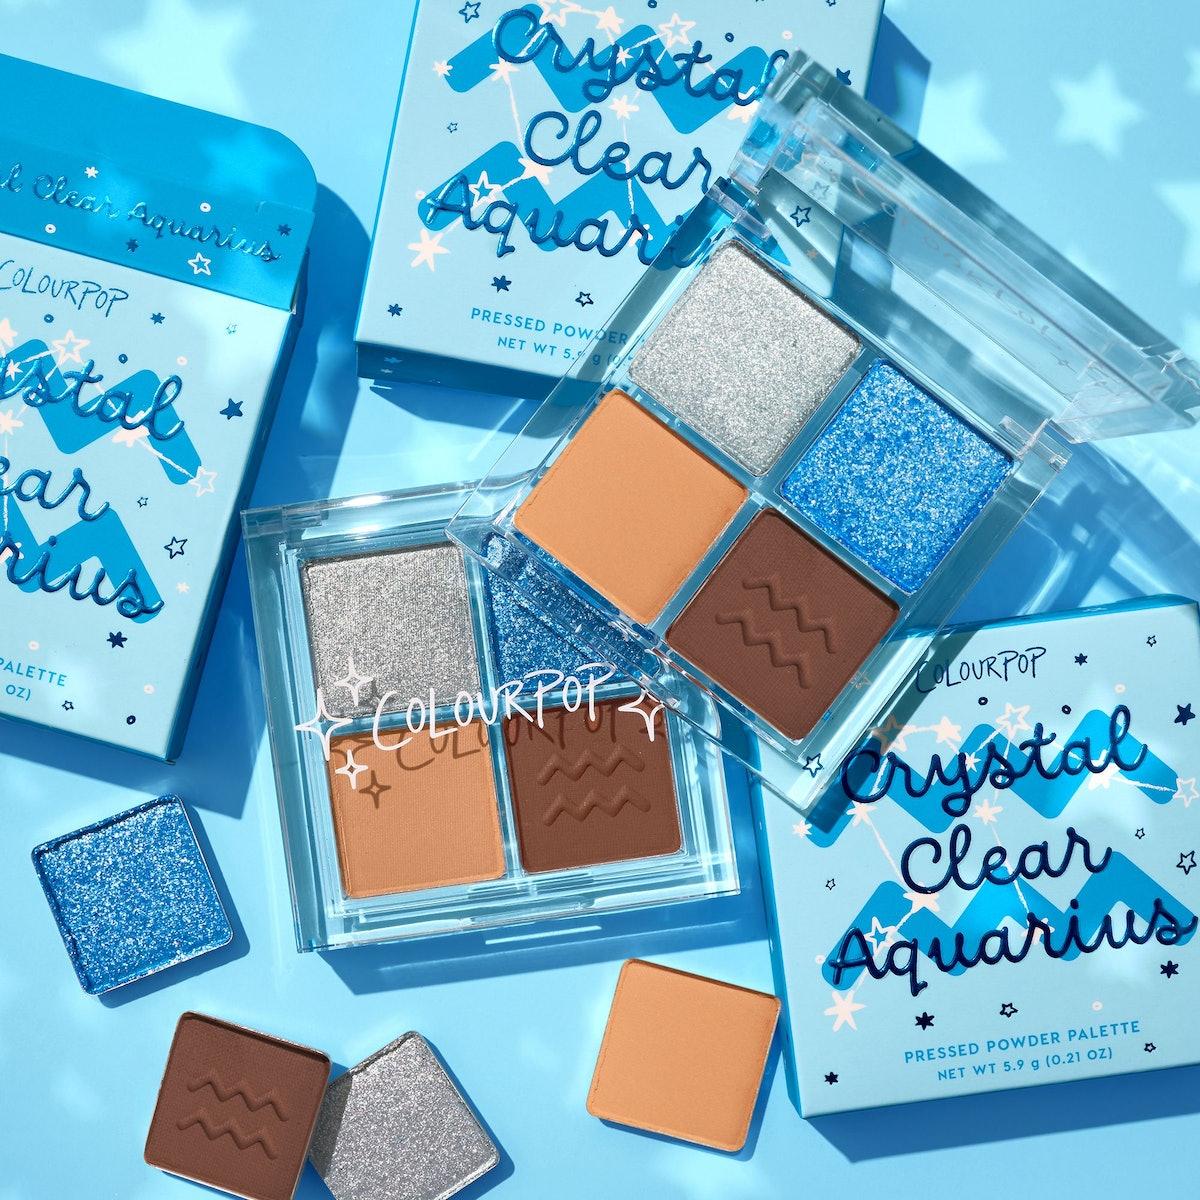 Crystal Clear Aquarius Eyeshadow Palette